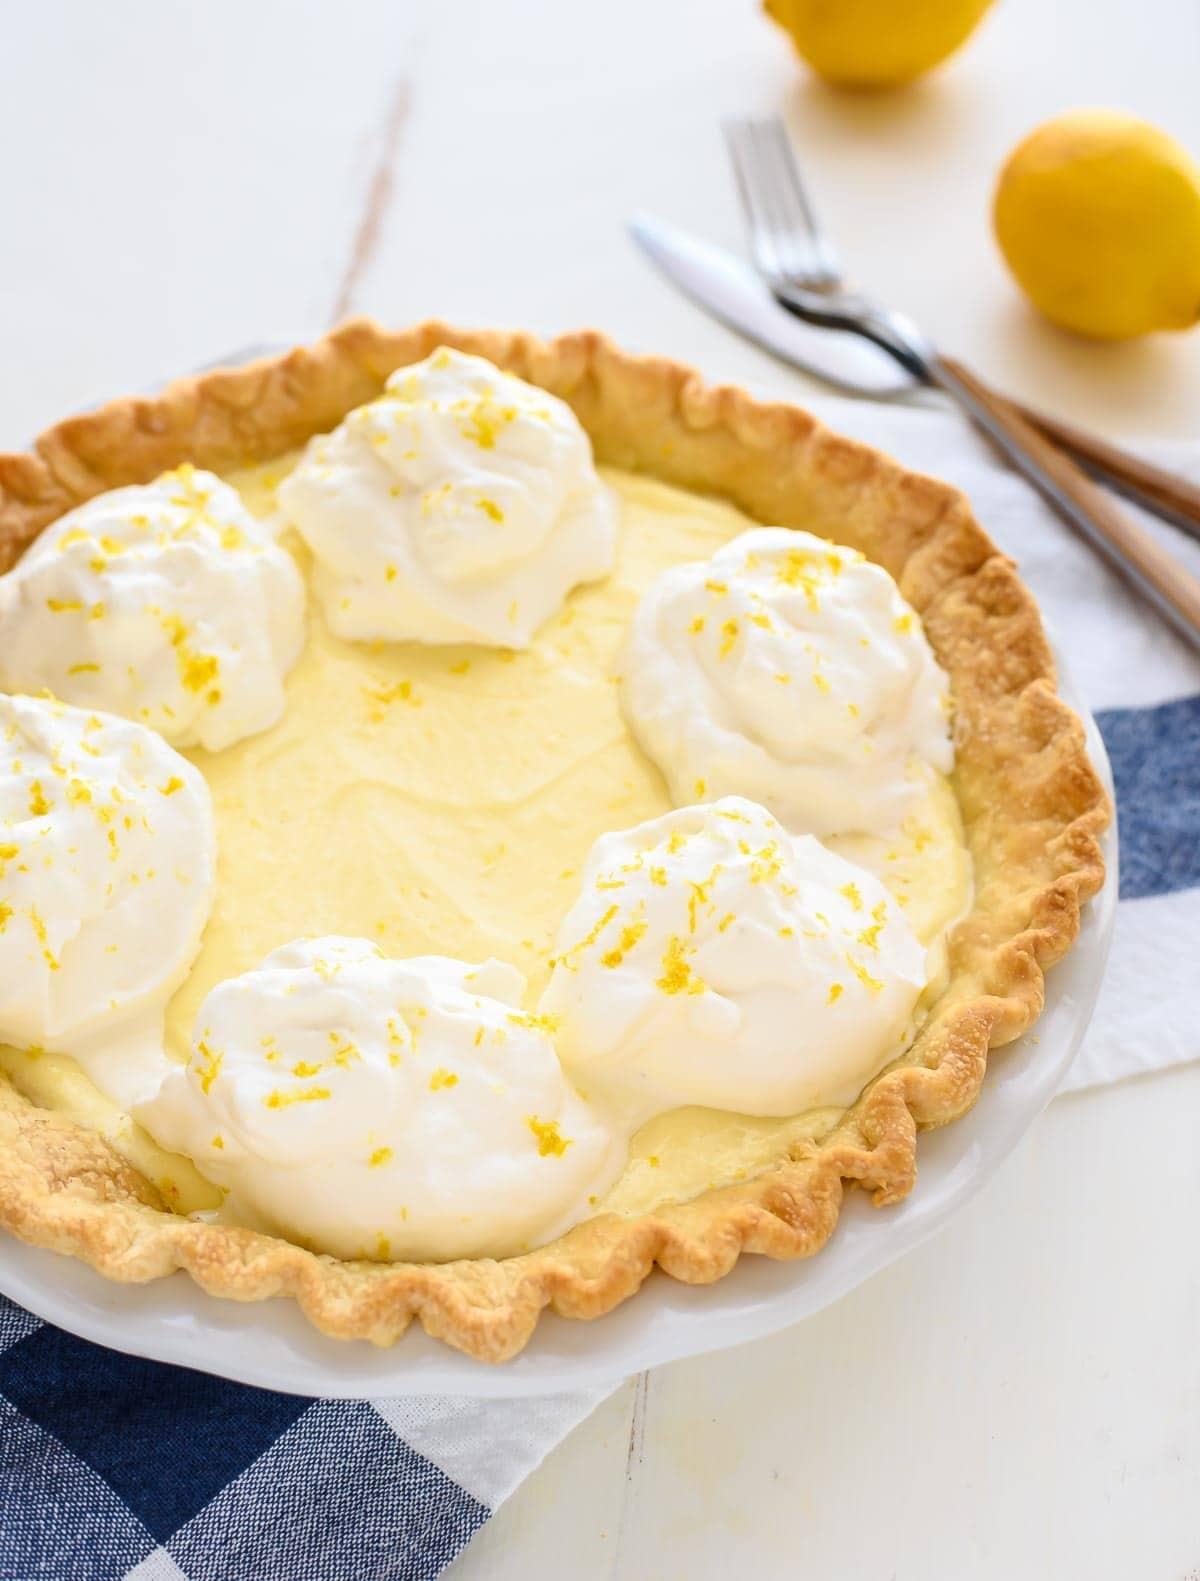 homemade Lemon Cream Pie. My grandmother's original recipe with lemon ...